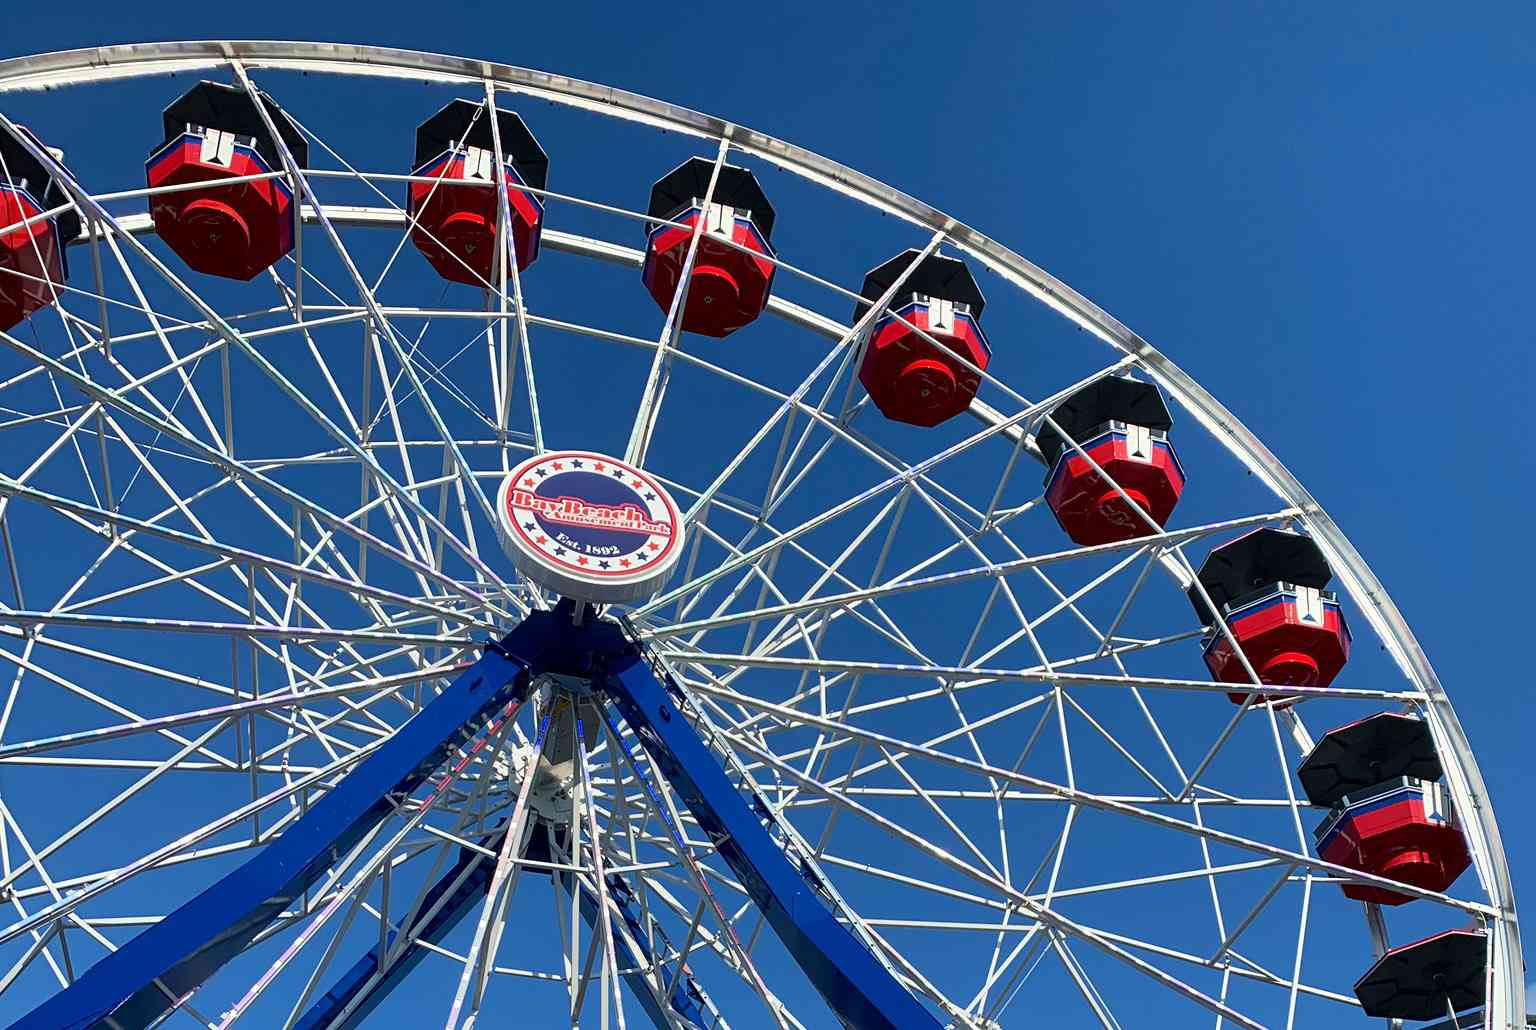 Wheel at Bay Beach park